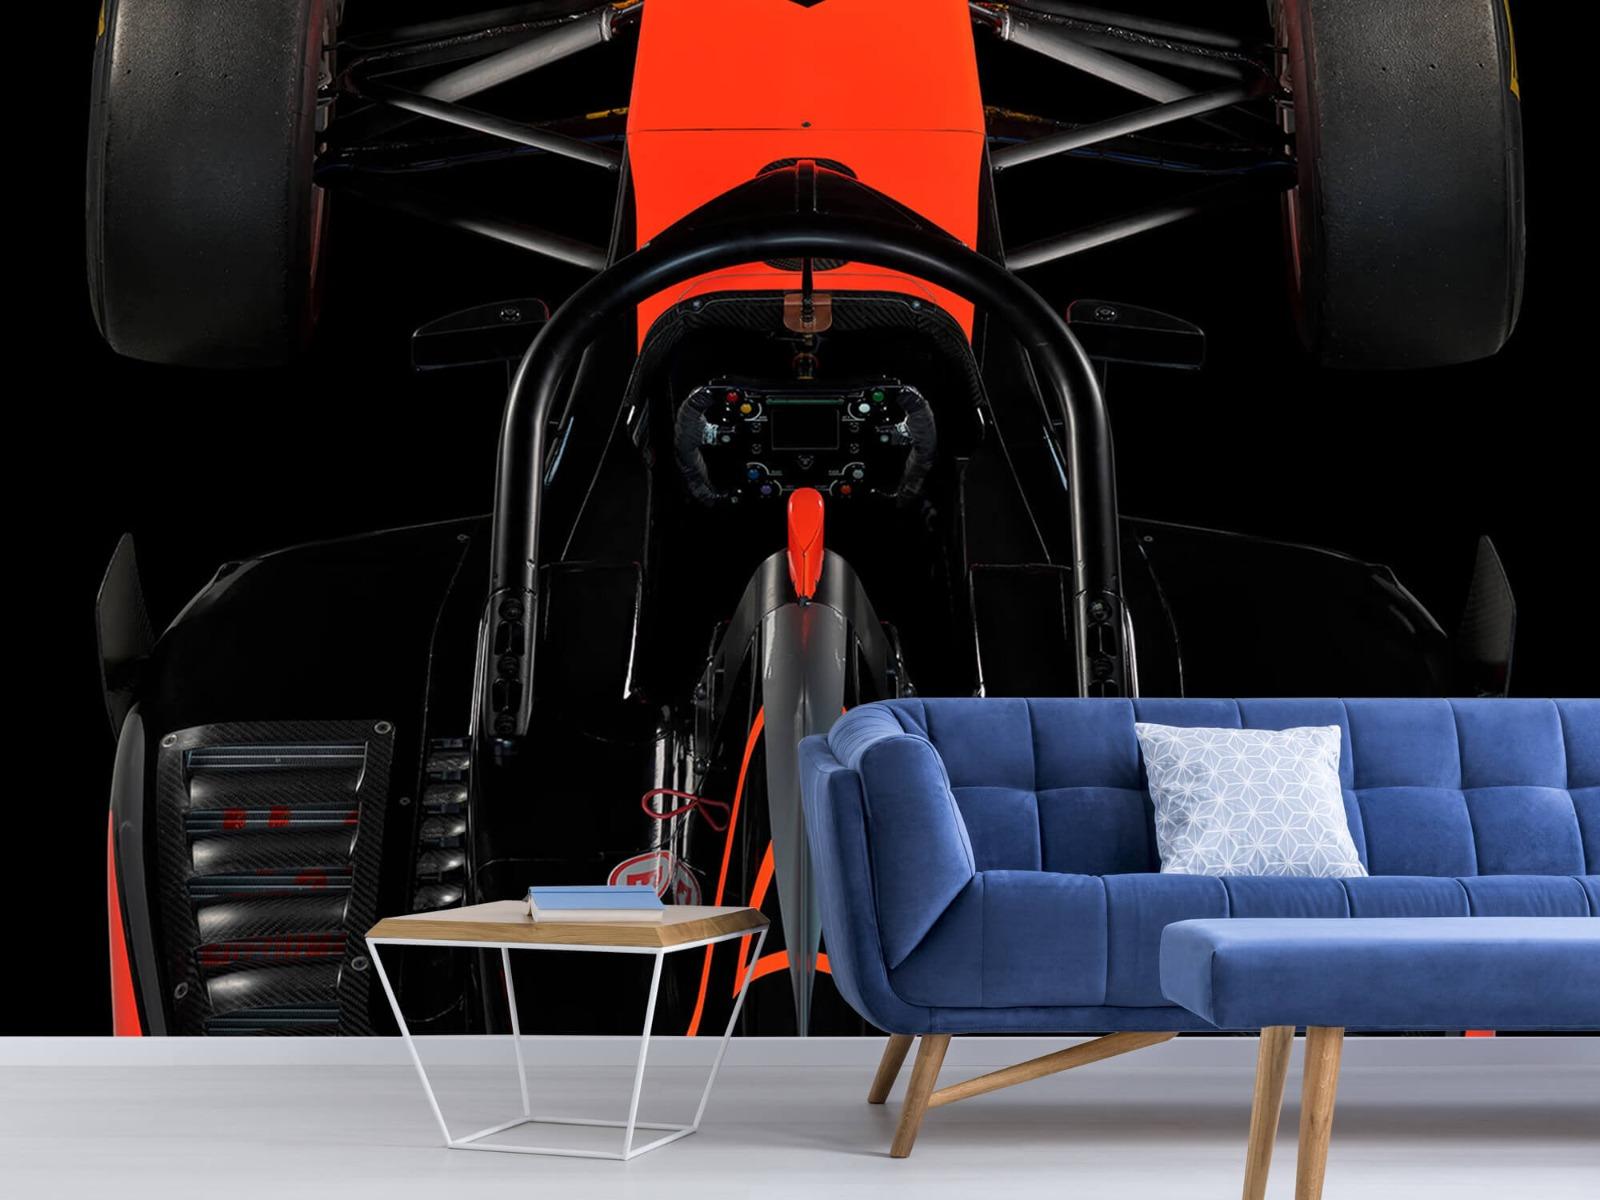 Sportauto's - Formule 3 - Cockpit view - dark - Tienerkamer 5